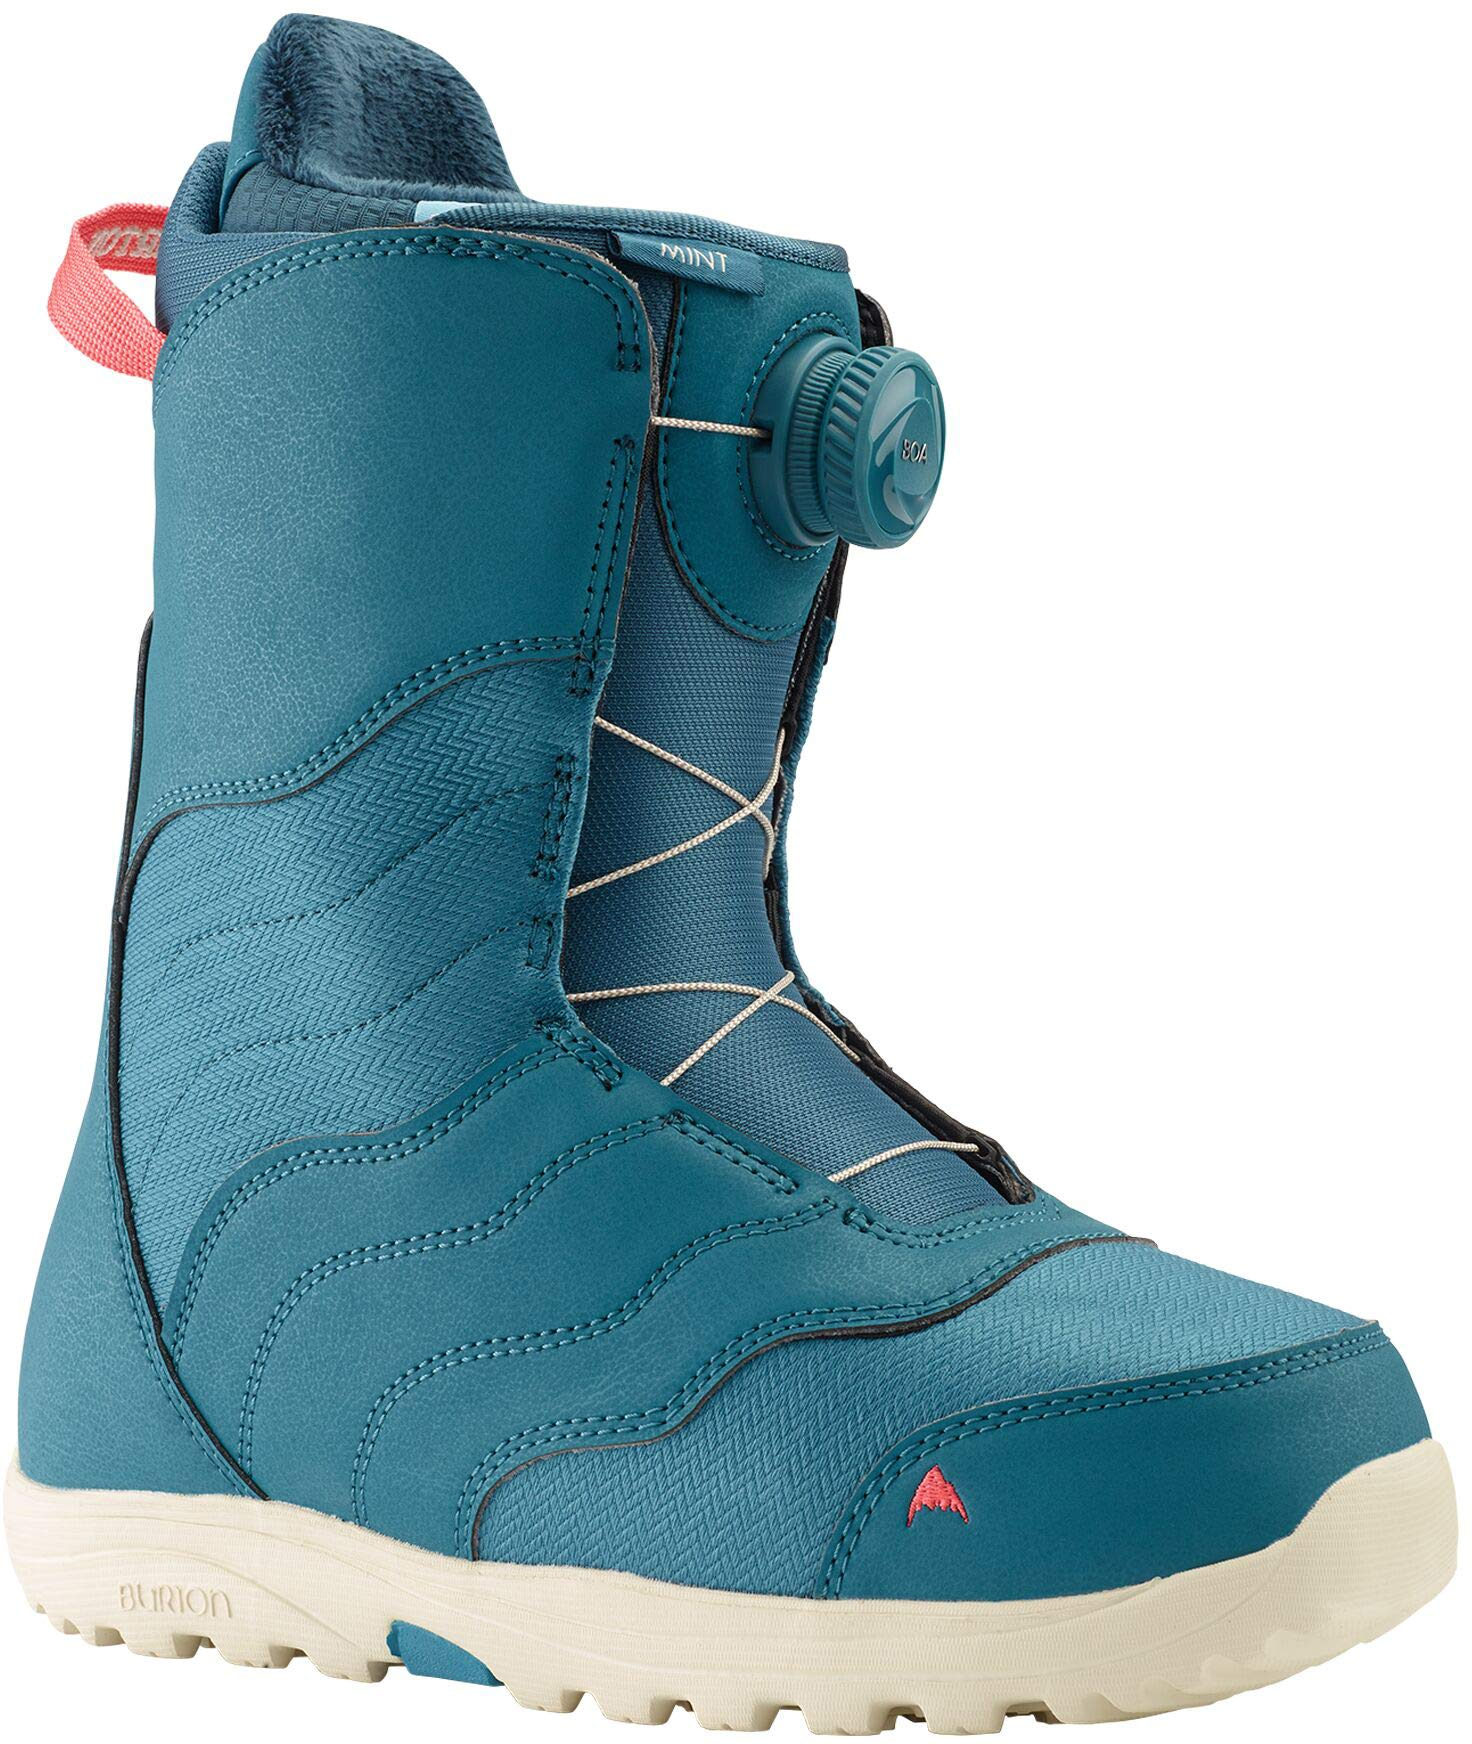 Burton Mint BOA Snowboard Boots Womens Sz 7 Storm Blue by Burton